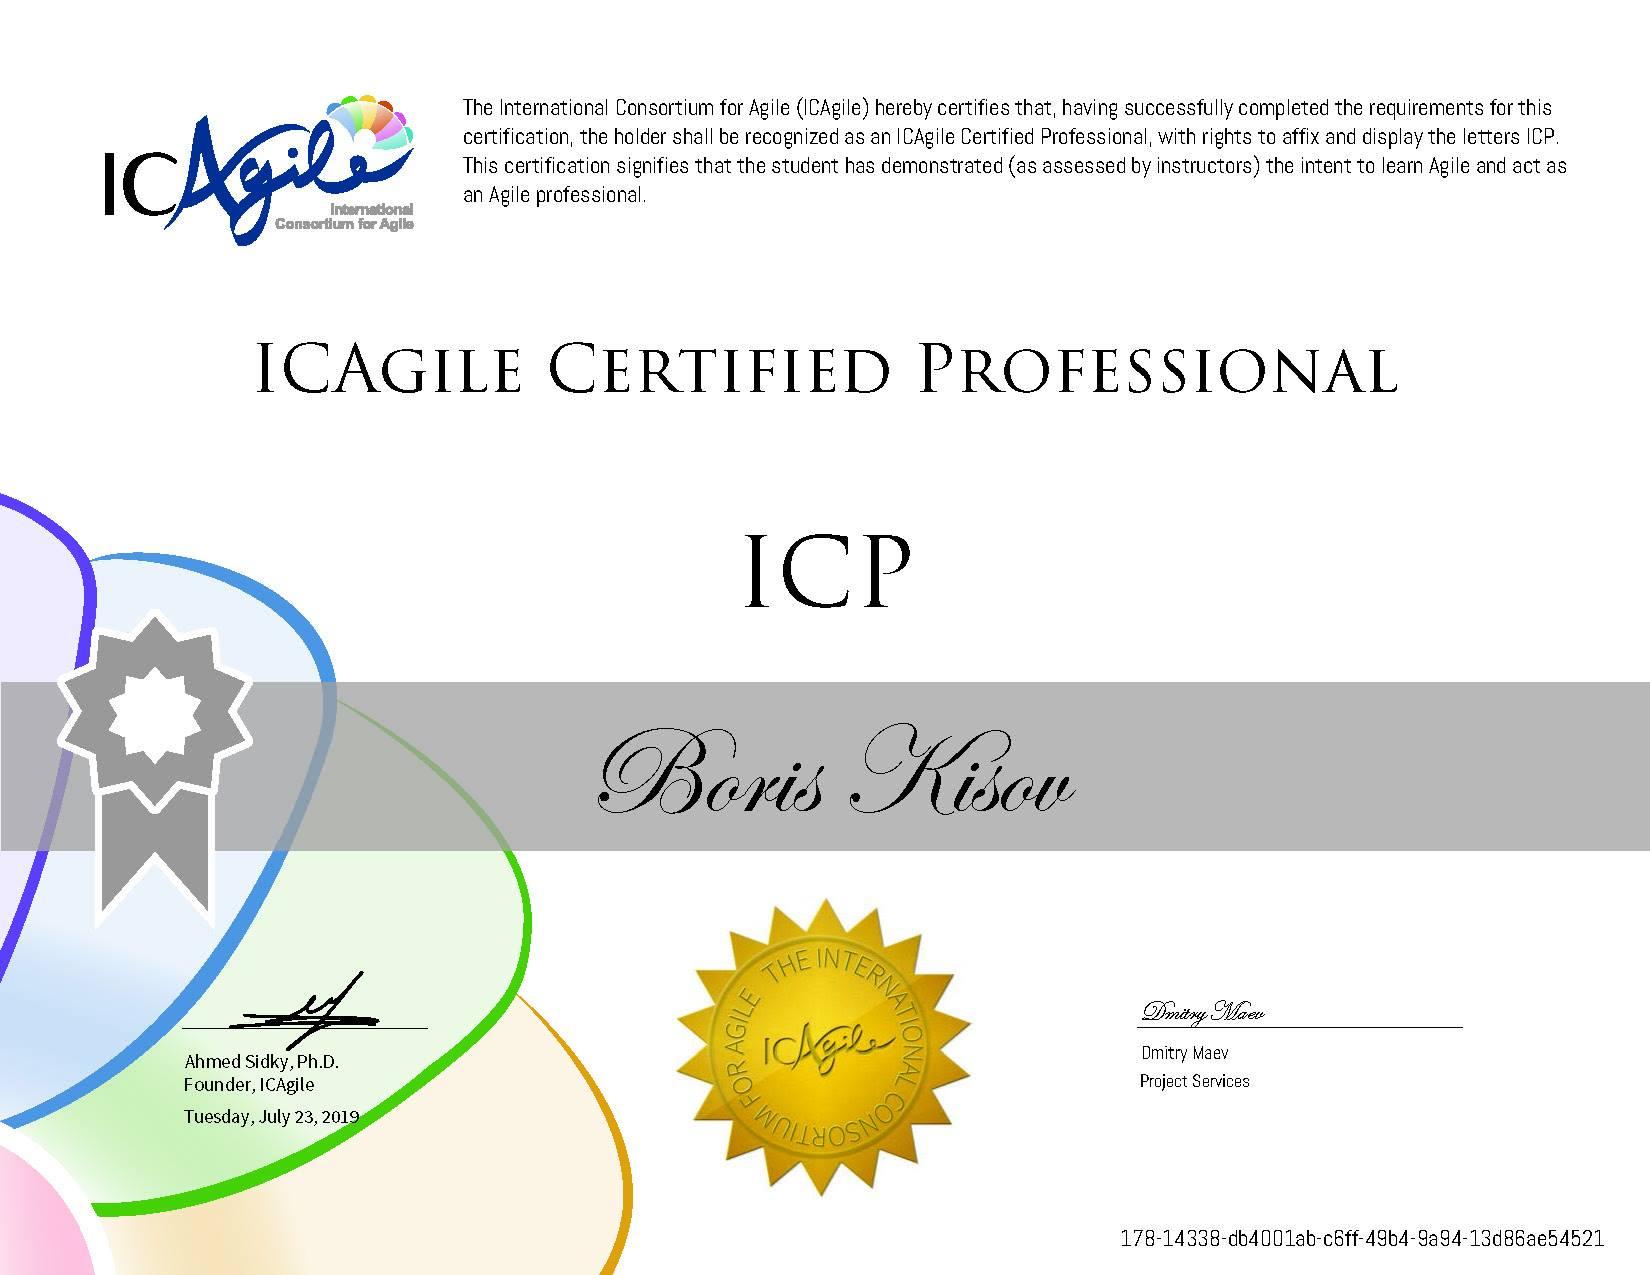 2. Agile Certified Professional